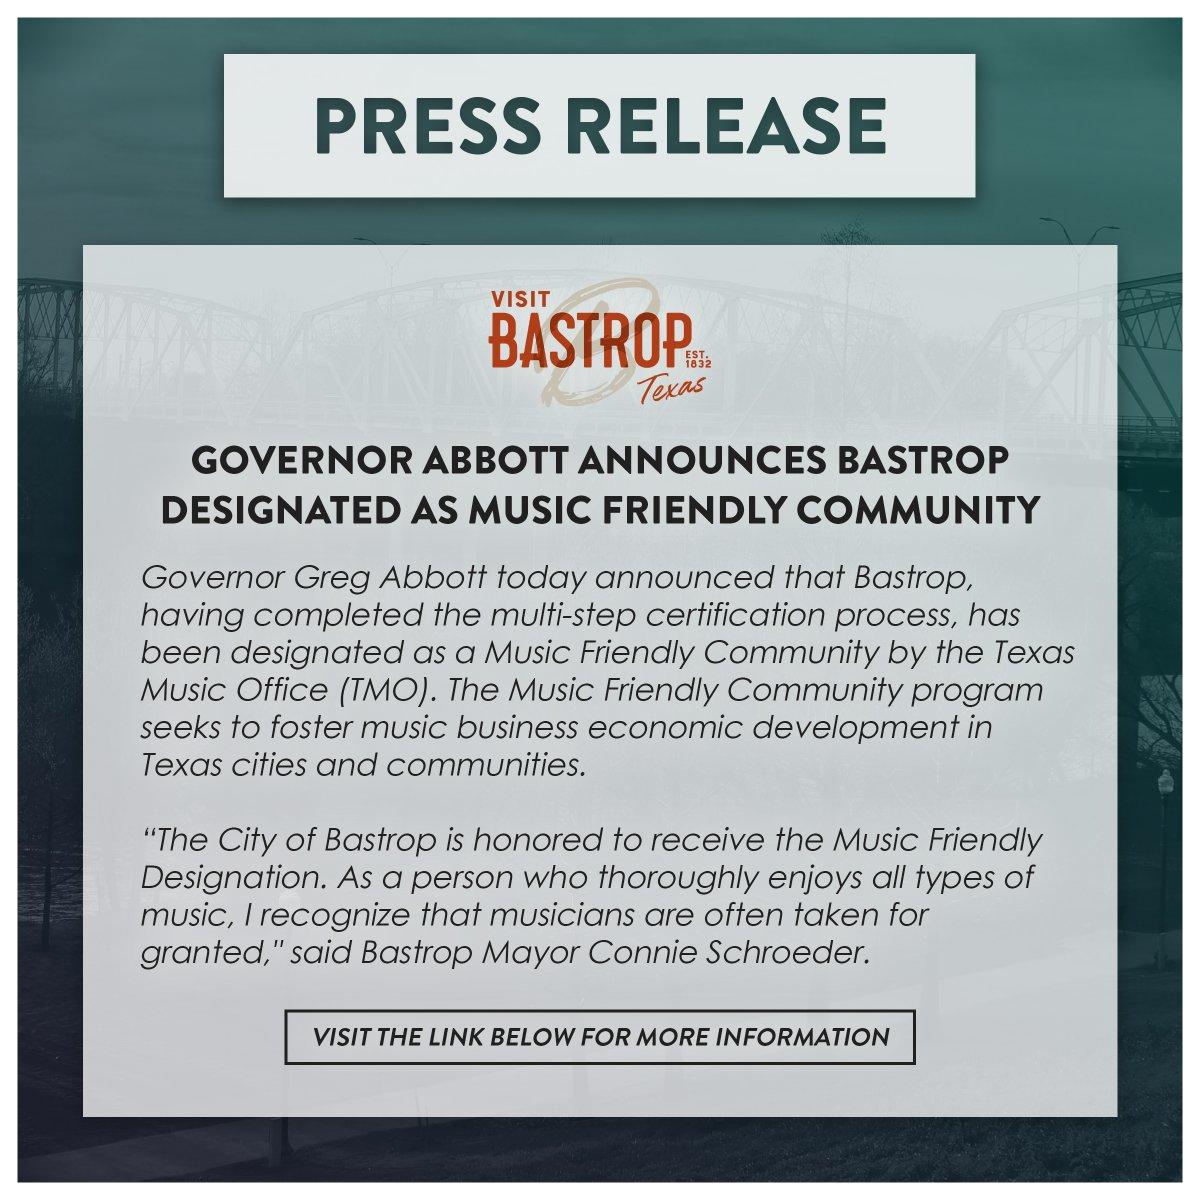 Press Release from Visit Bastrop! Visit the link below for more information!